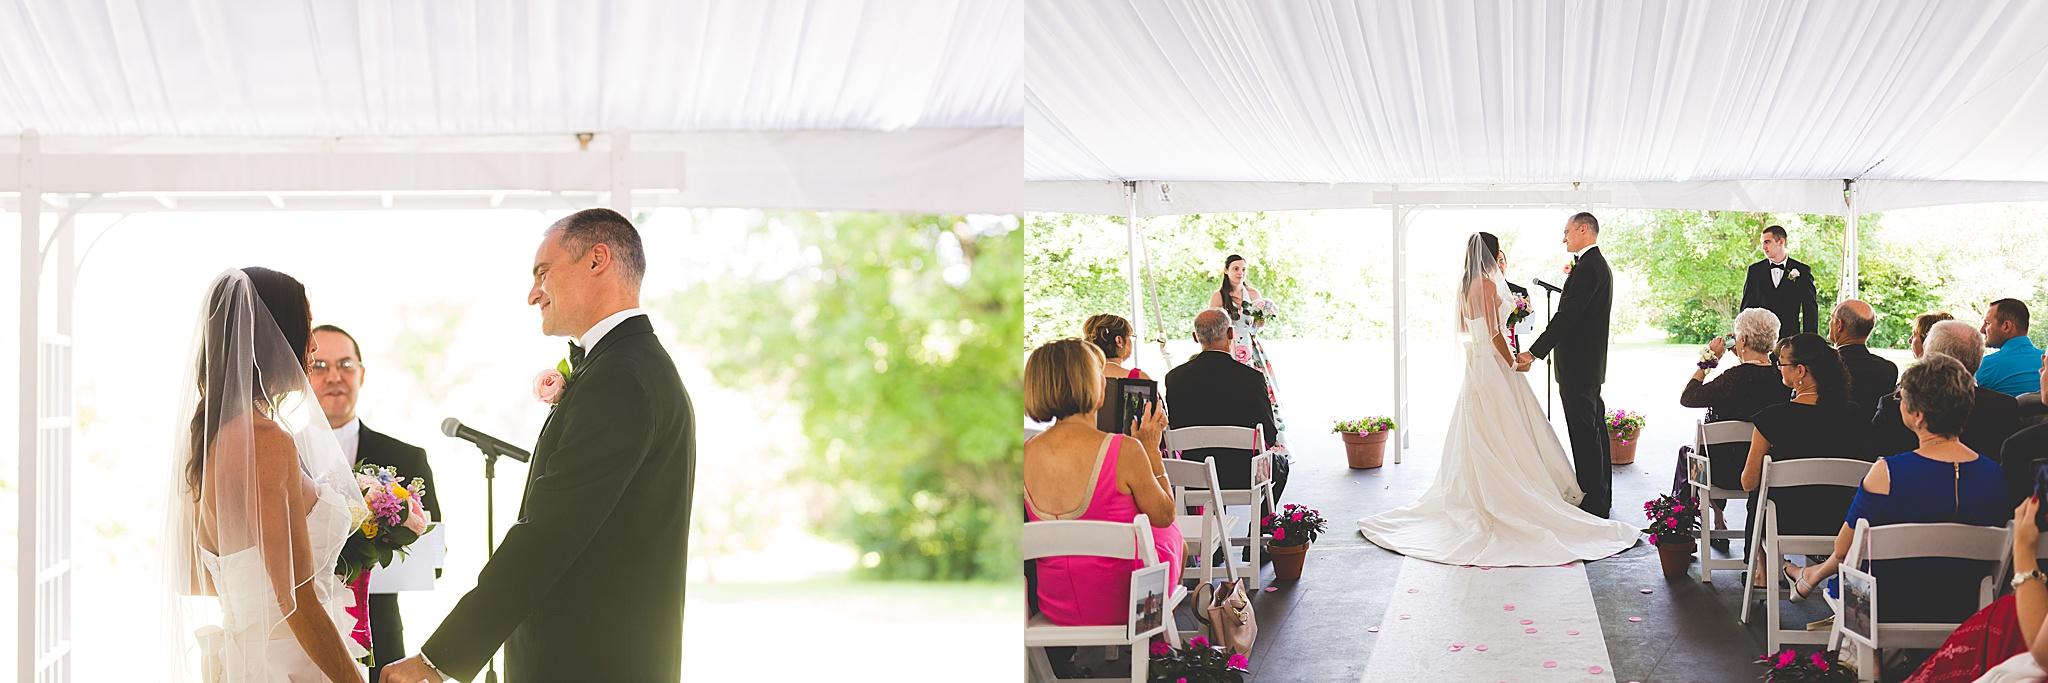 Albany_Wedding_Photographer_7630.jpg